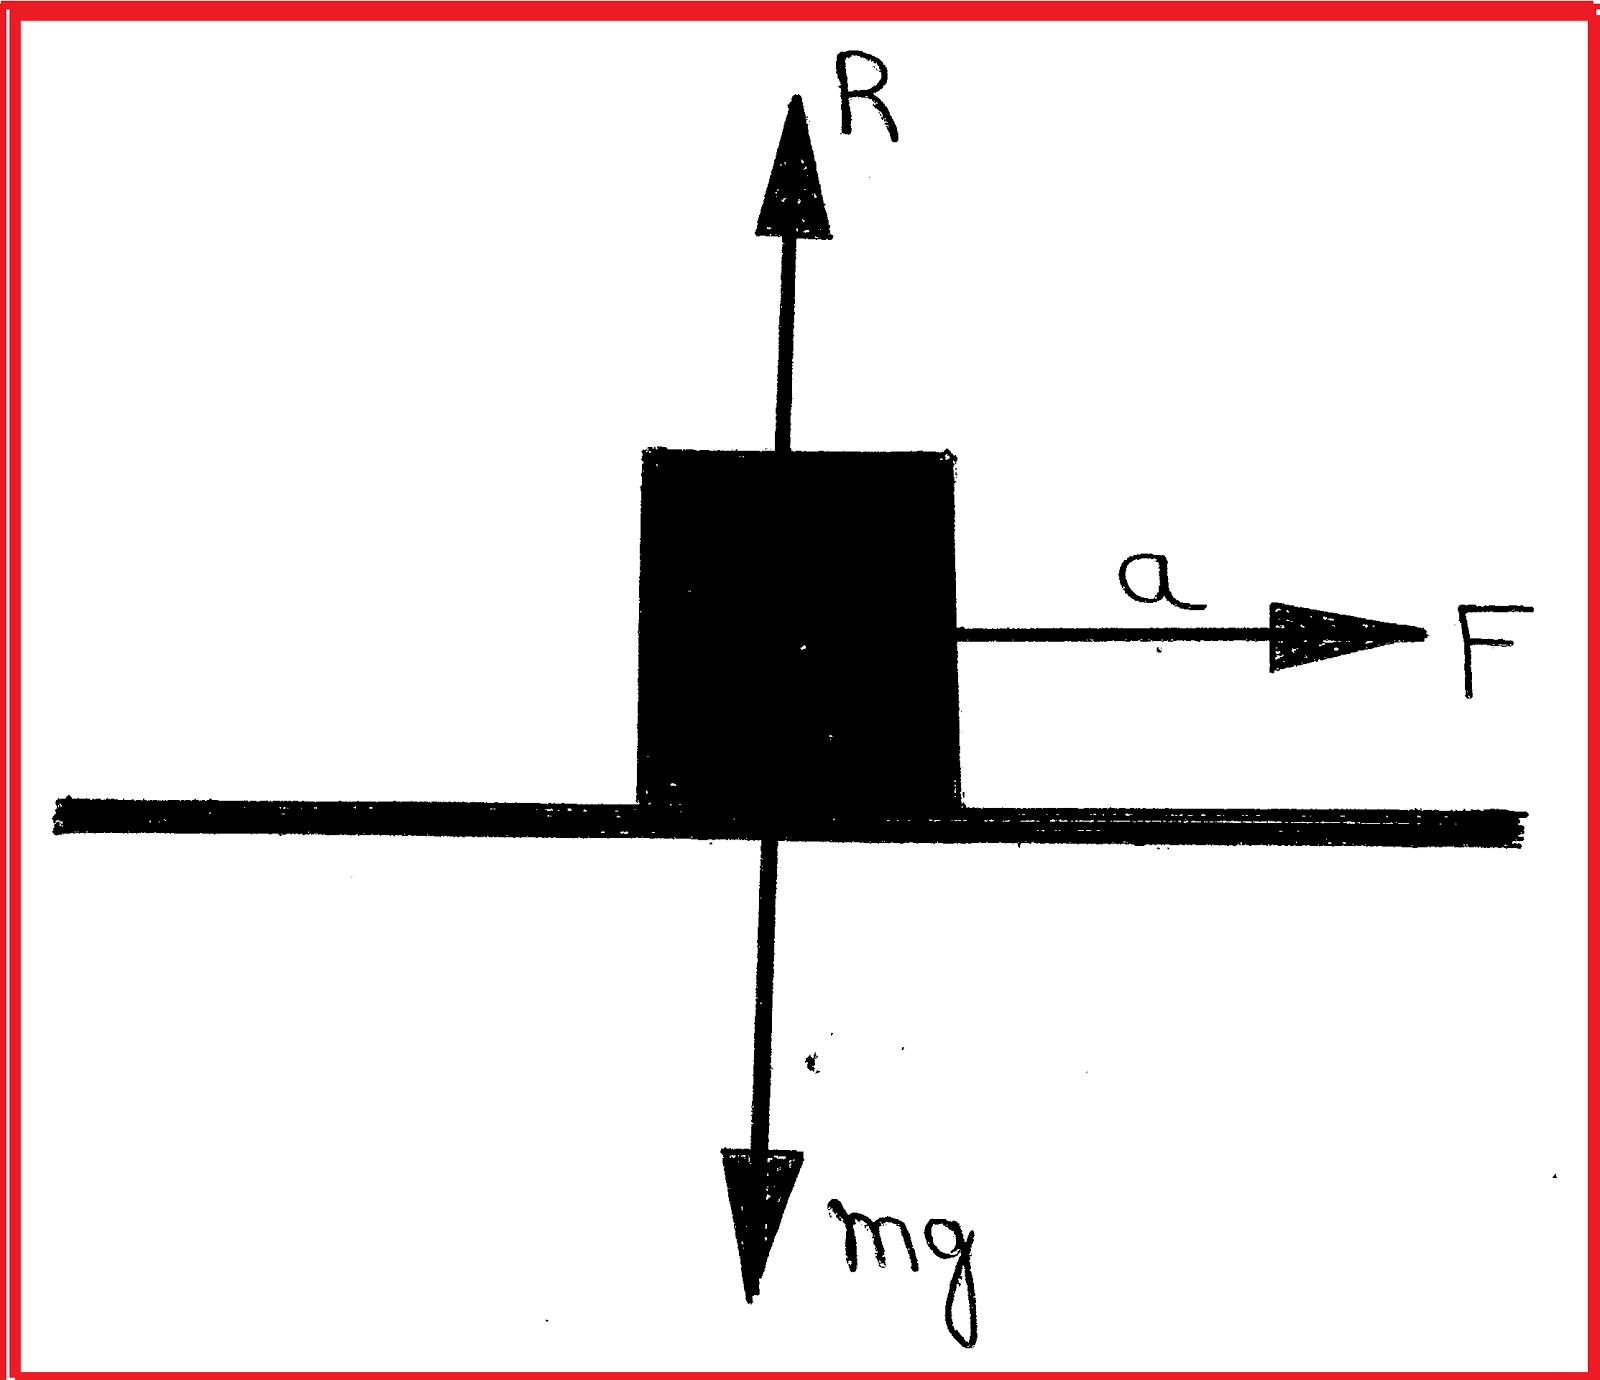 Grade-12 Physics: Mechanics